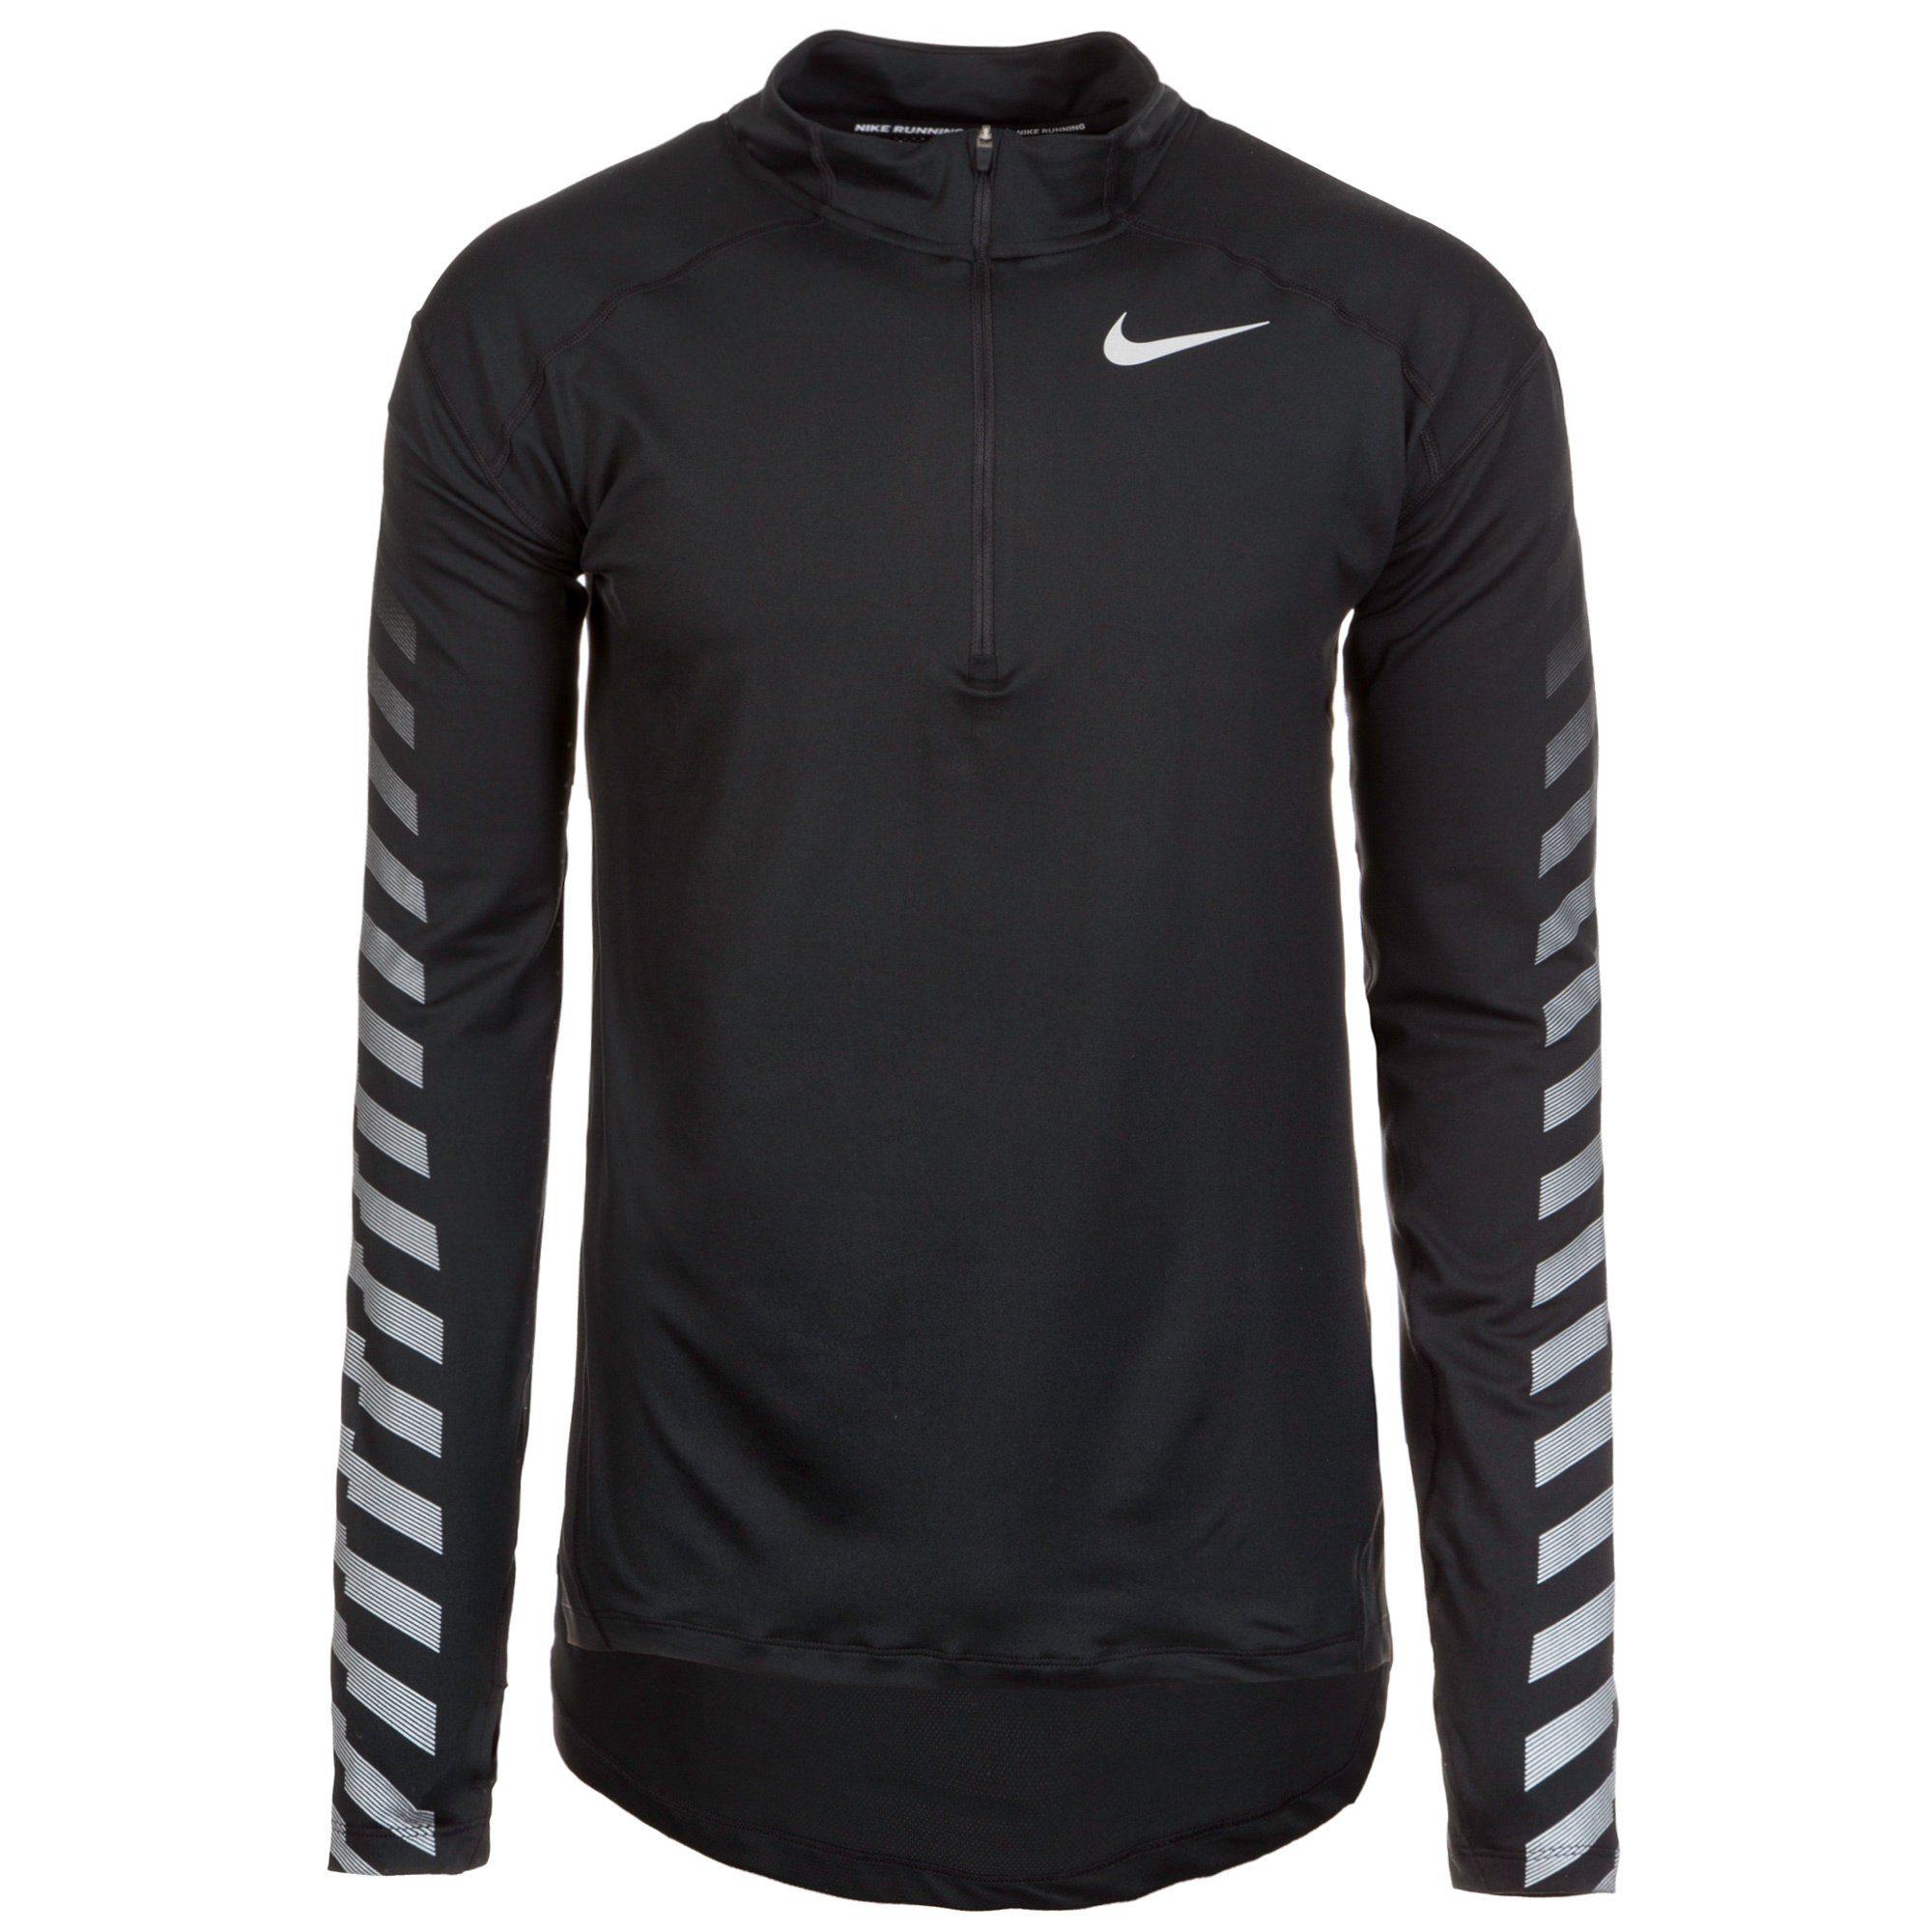 Nike Laufshirt Dry Flash Element | Sportbekleidung > Sportshirts > Laufshirts | Schwarz | Nike